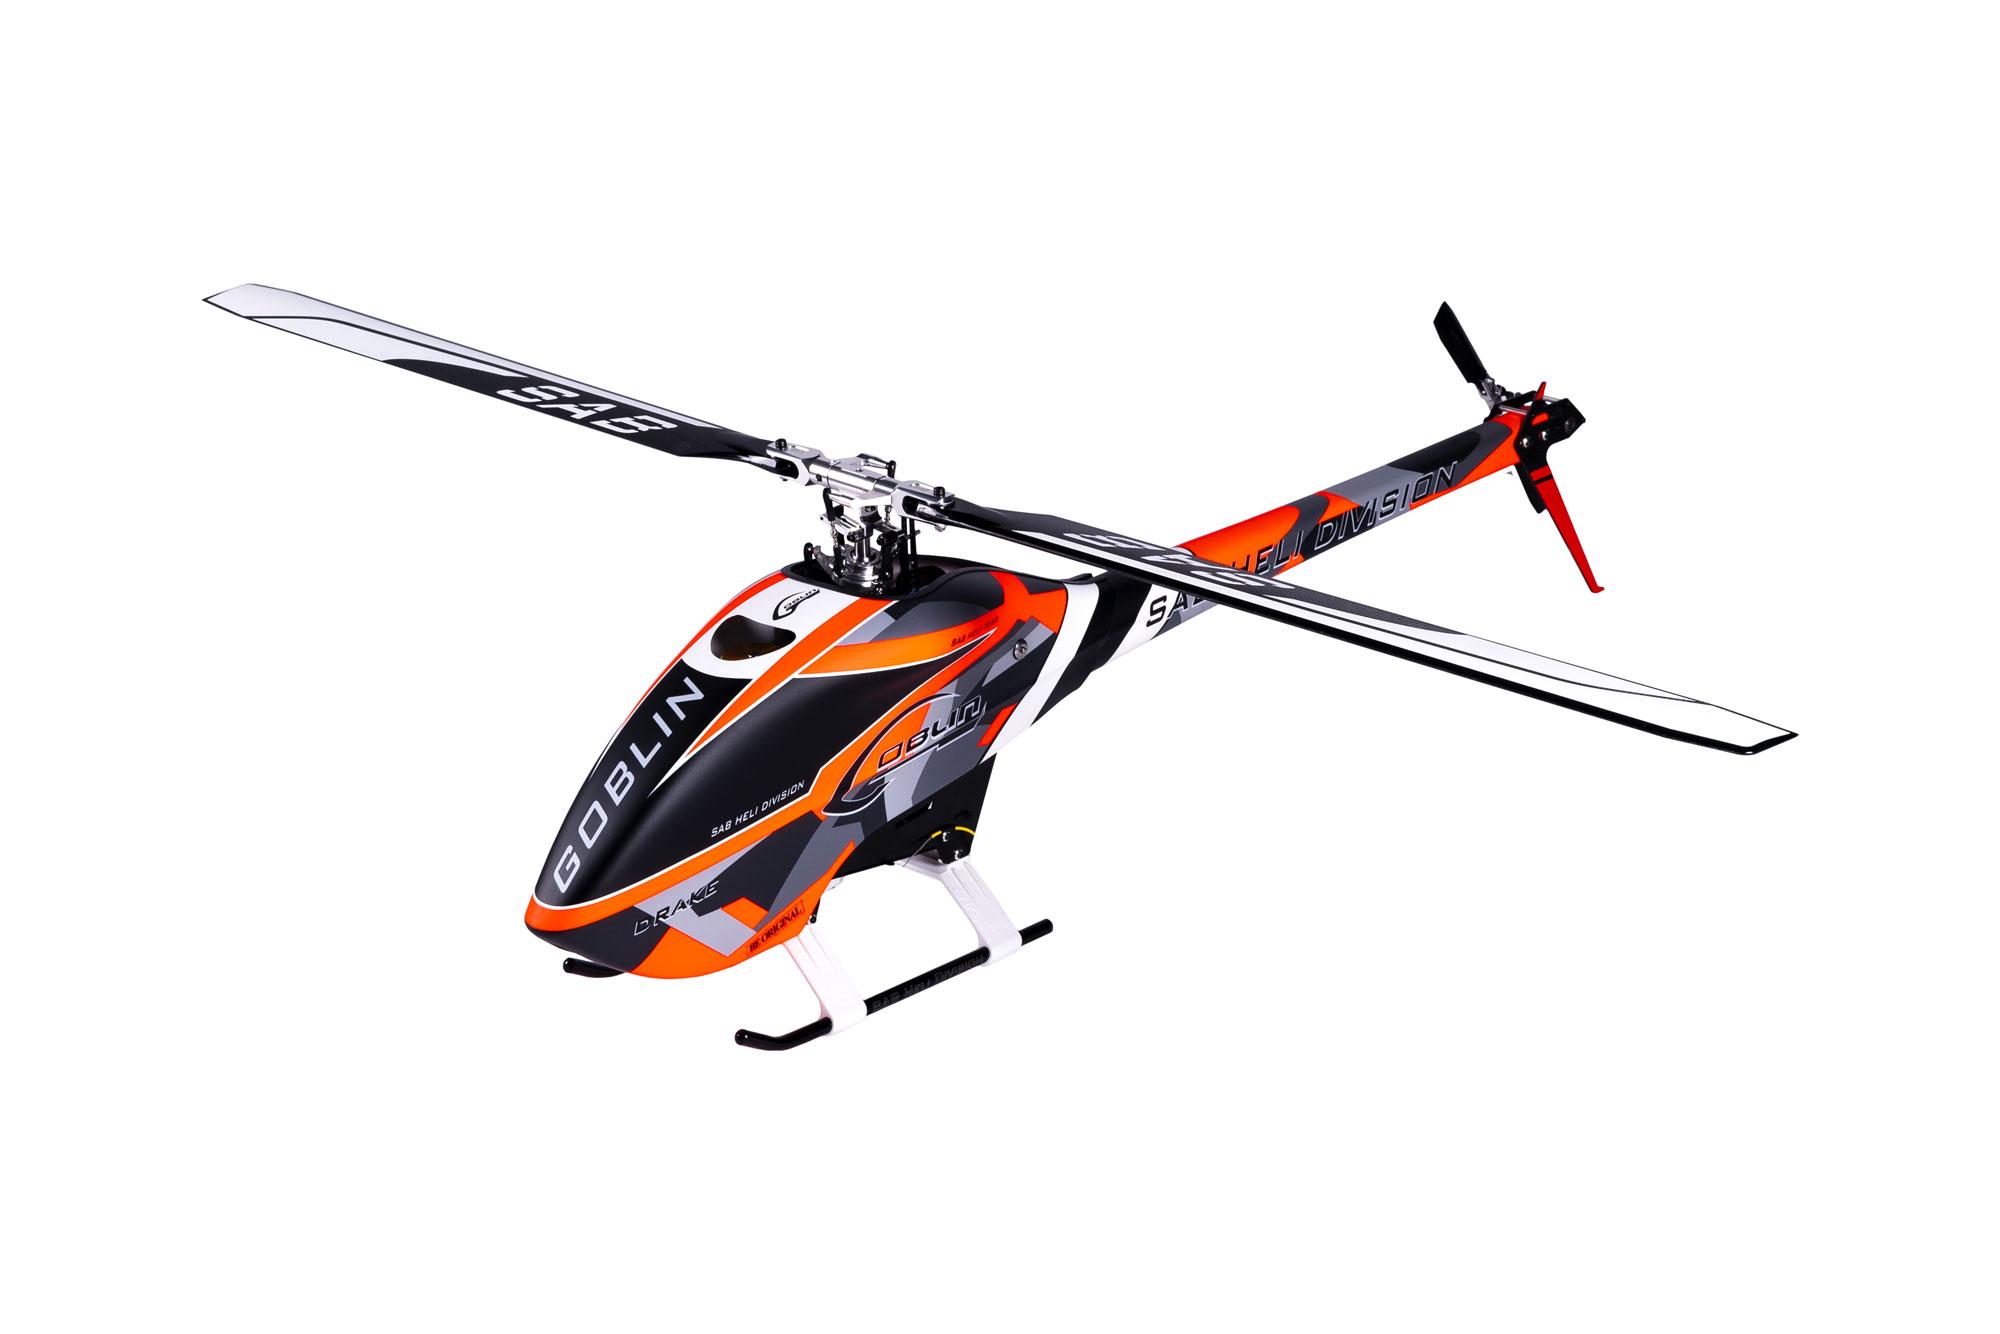 Goblin 570 Sport Goblin Helicopters